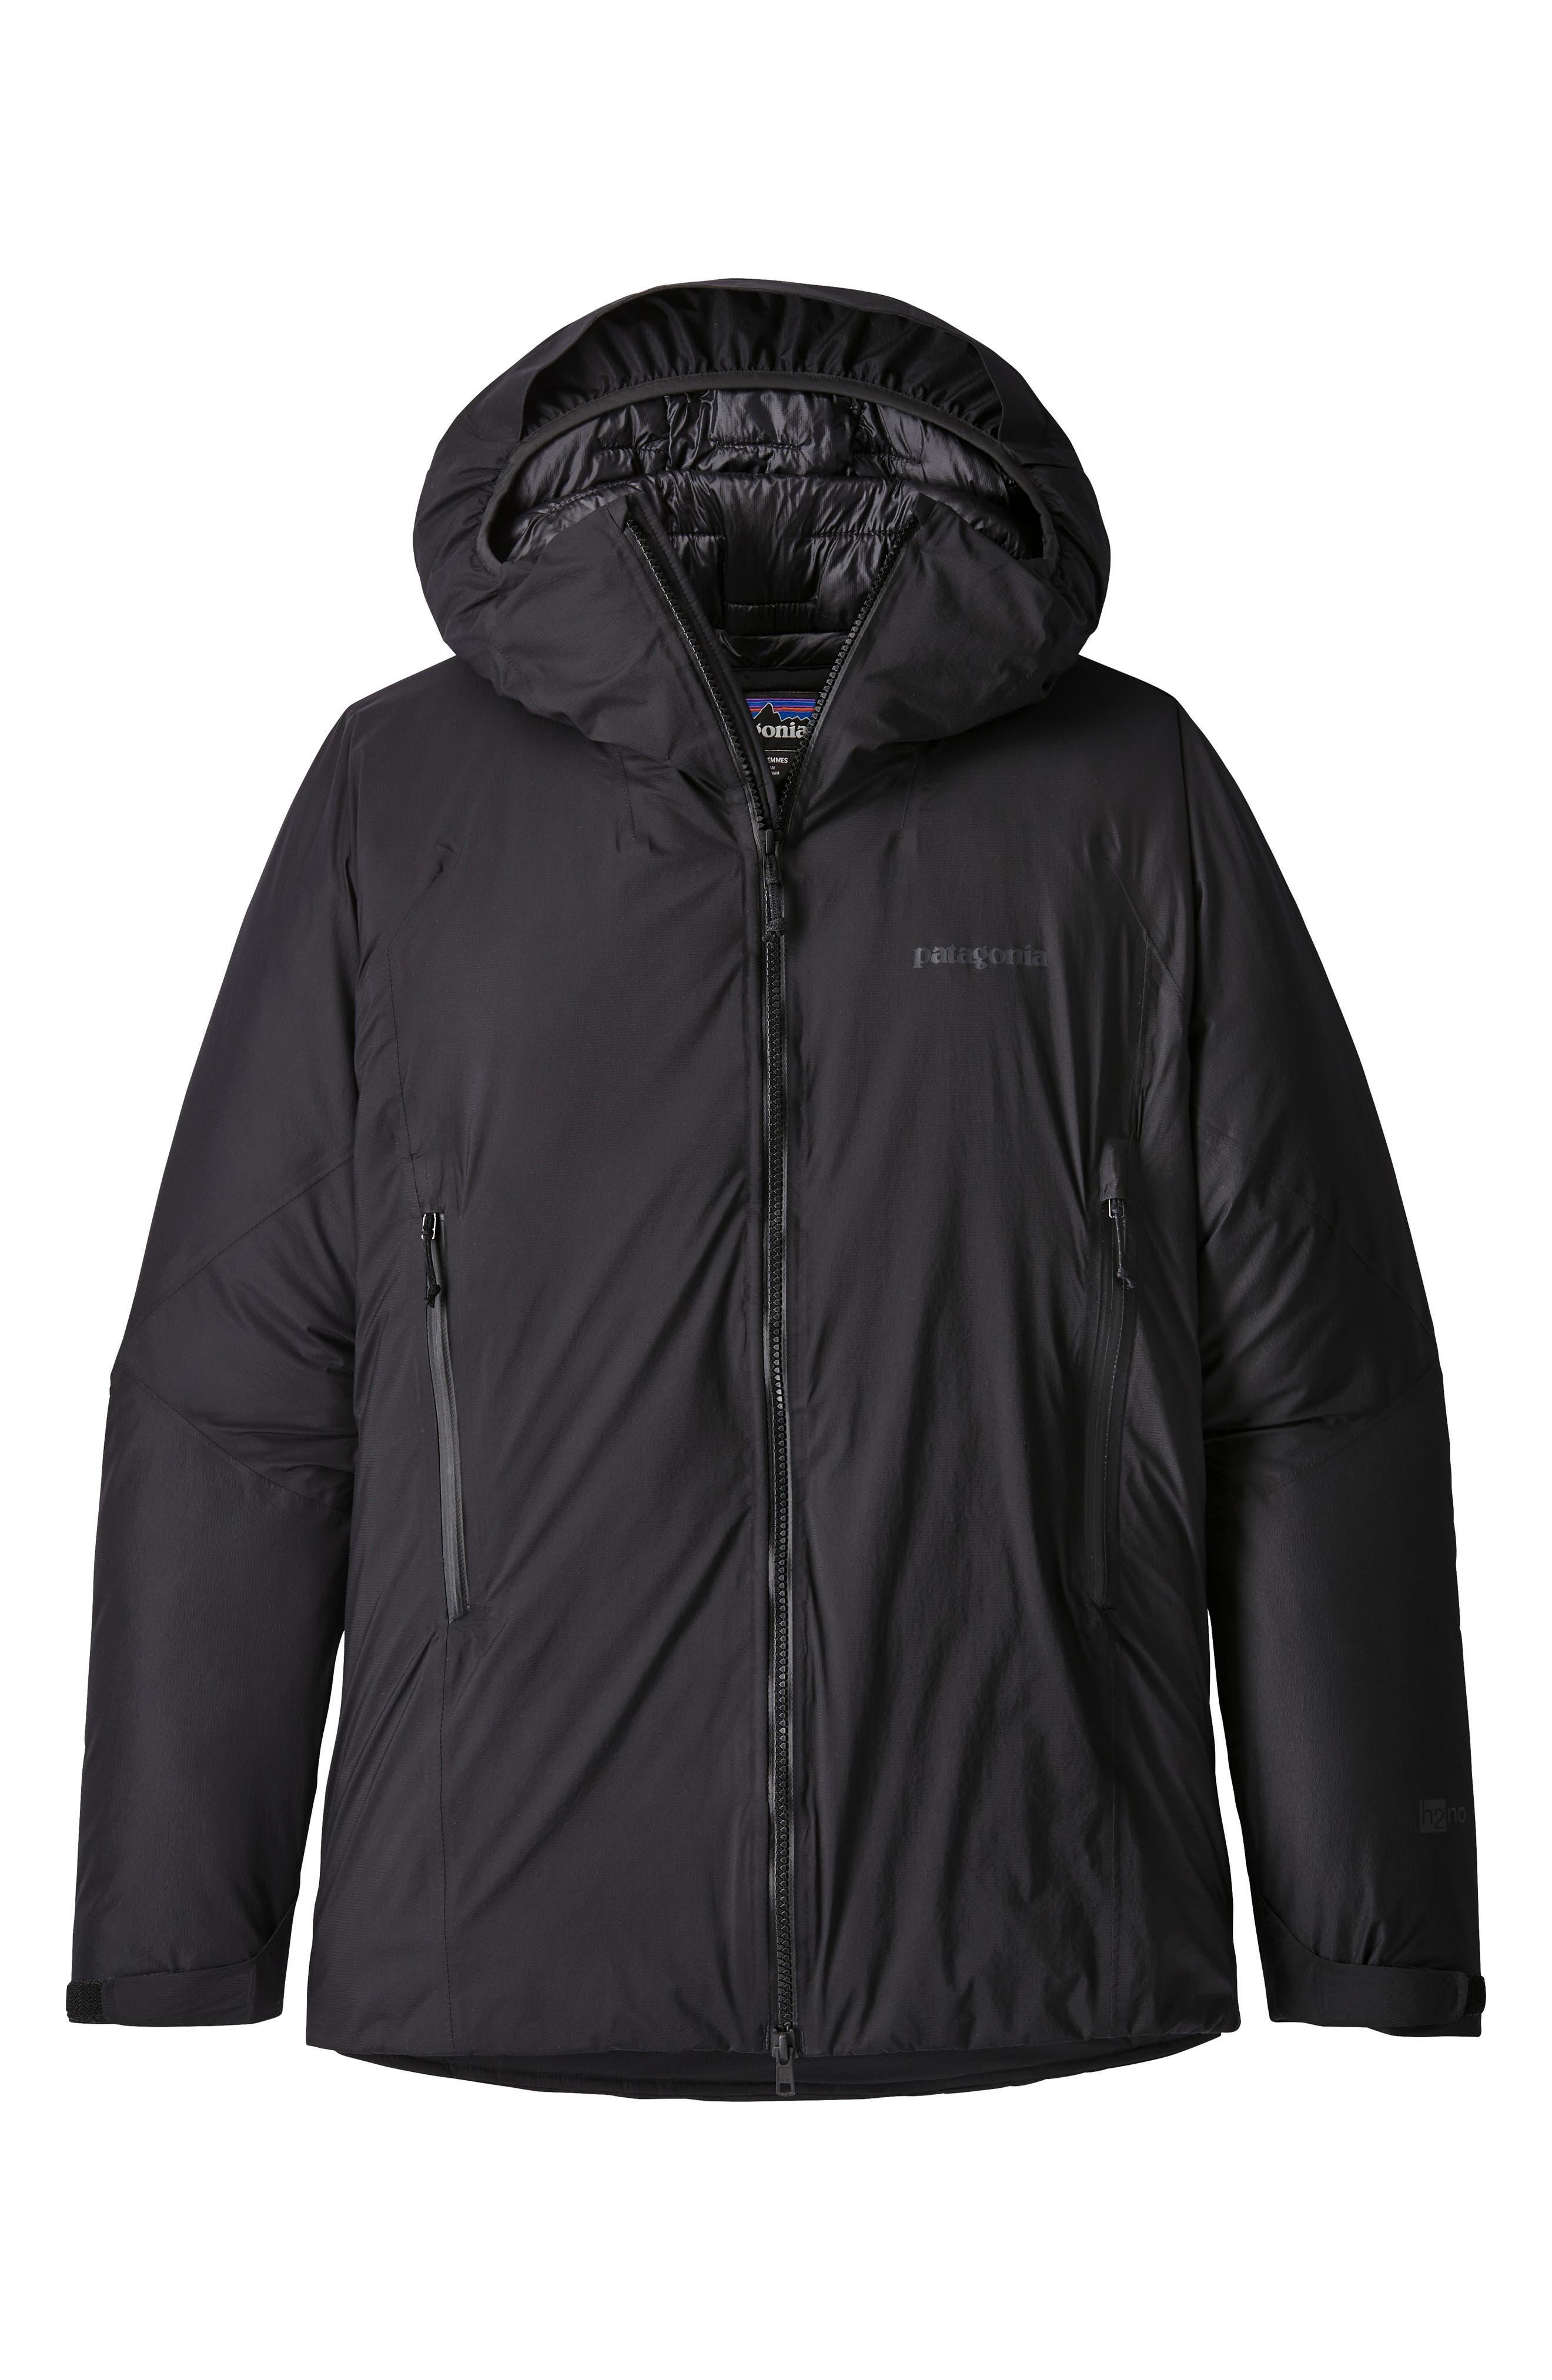 Micro Puff<sup>®</sup> Waterproof Storm Jacket,                             Alternate thumbnail 5, color,                             BLACK